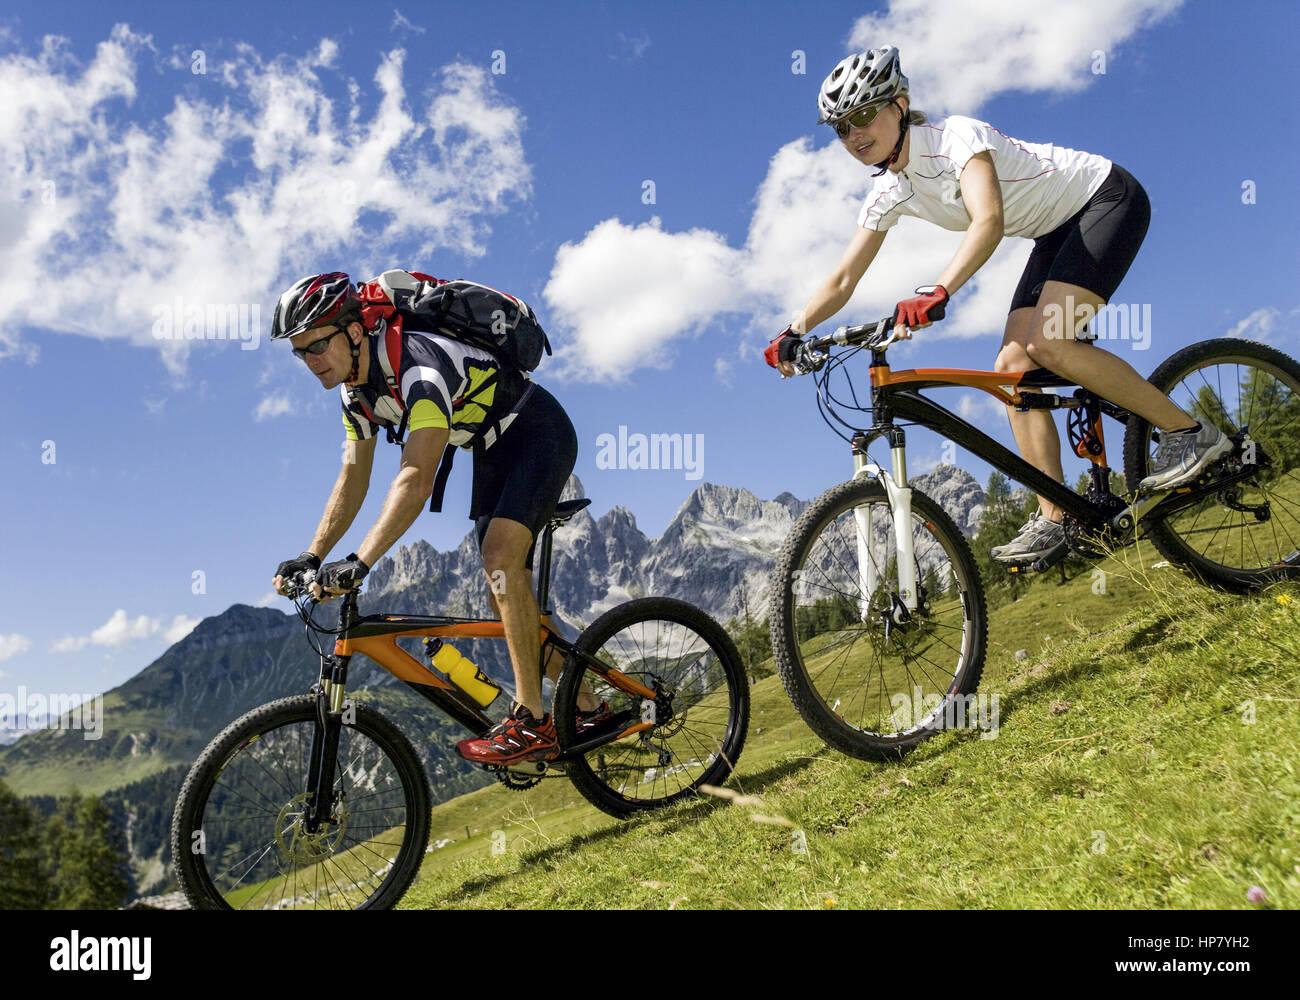 Paerchen mit Mountainbike im Gebirge (model-released) - Stock Image